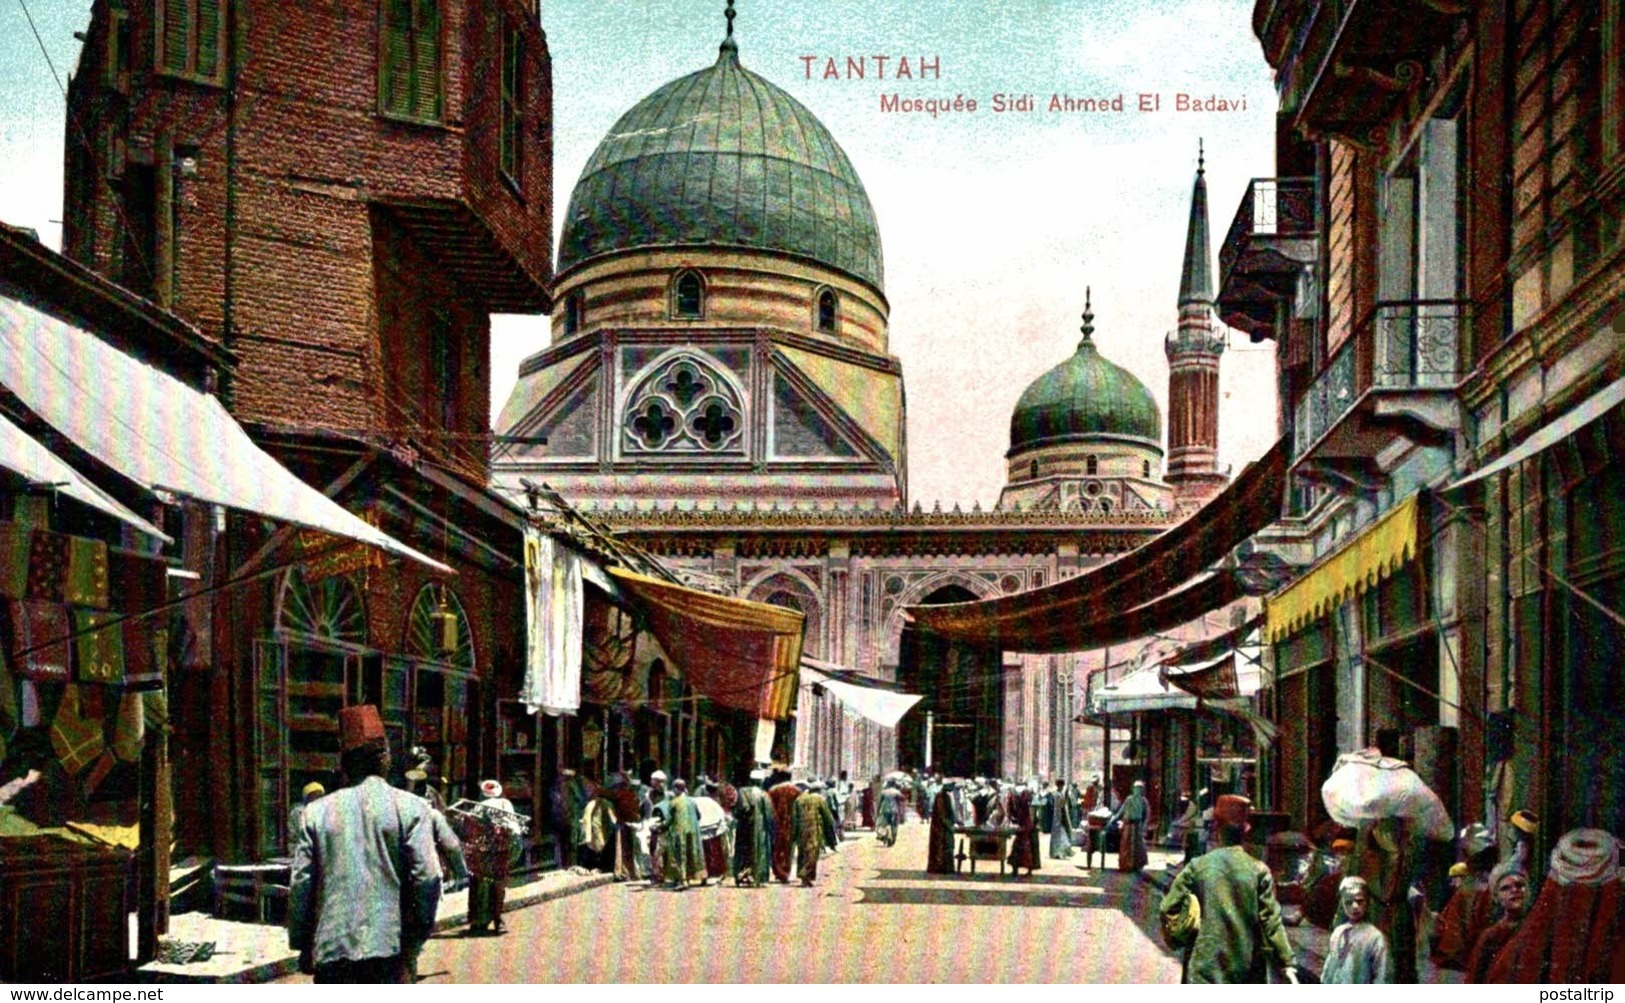 TANTAH, Mosquee Sidi Ahmed El Badawl Egypte Egypt EGYPTE - EGYPT - Tanta